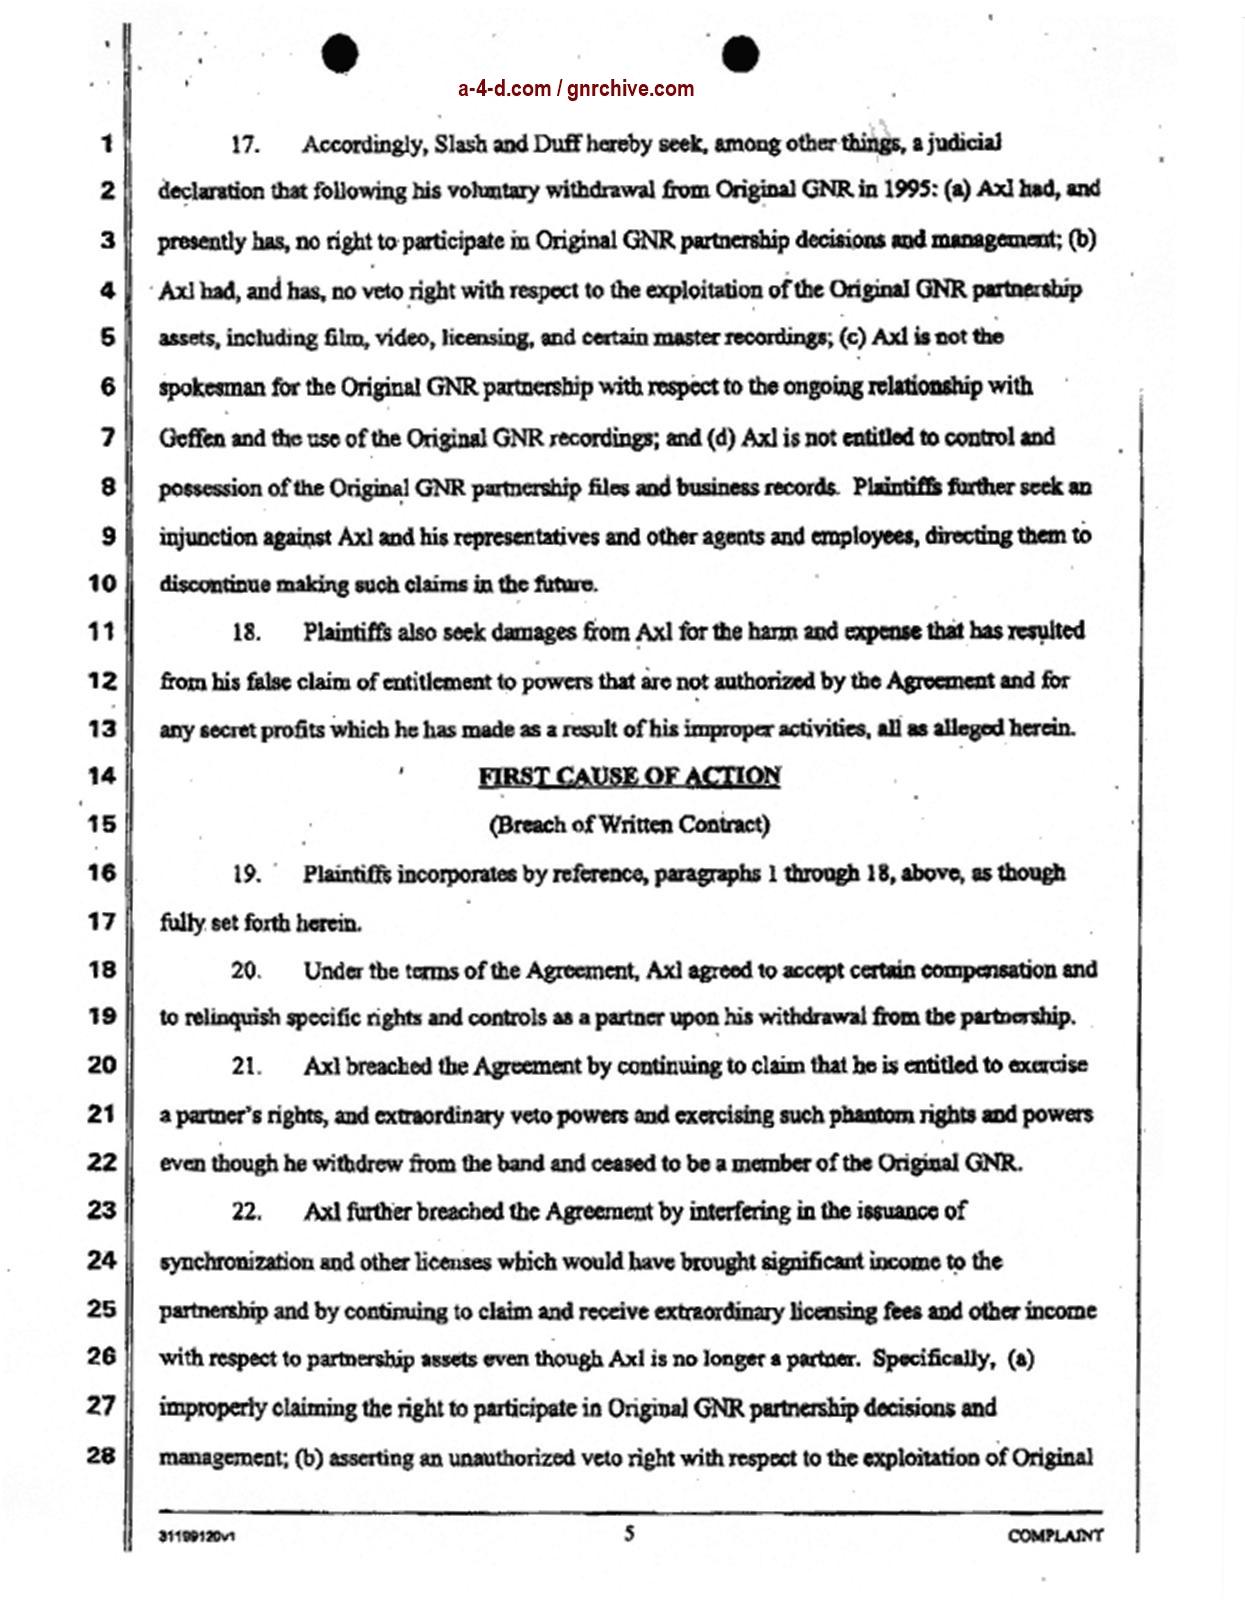 2004.04.29 - Slash & Duff Vs. Axl Lawsuit Document  2004_041